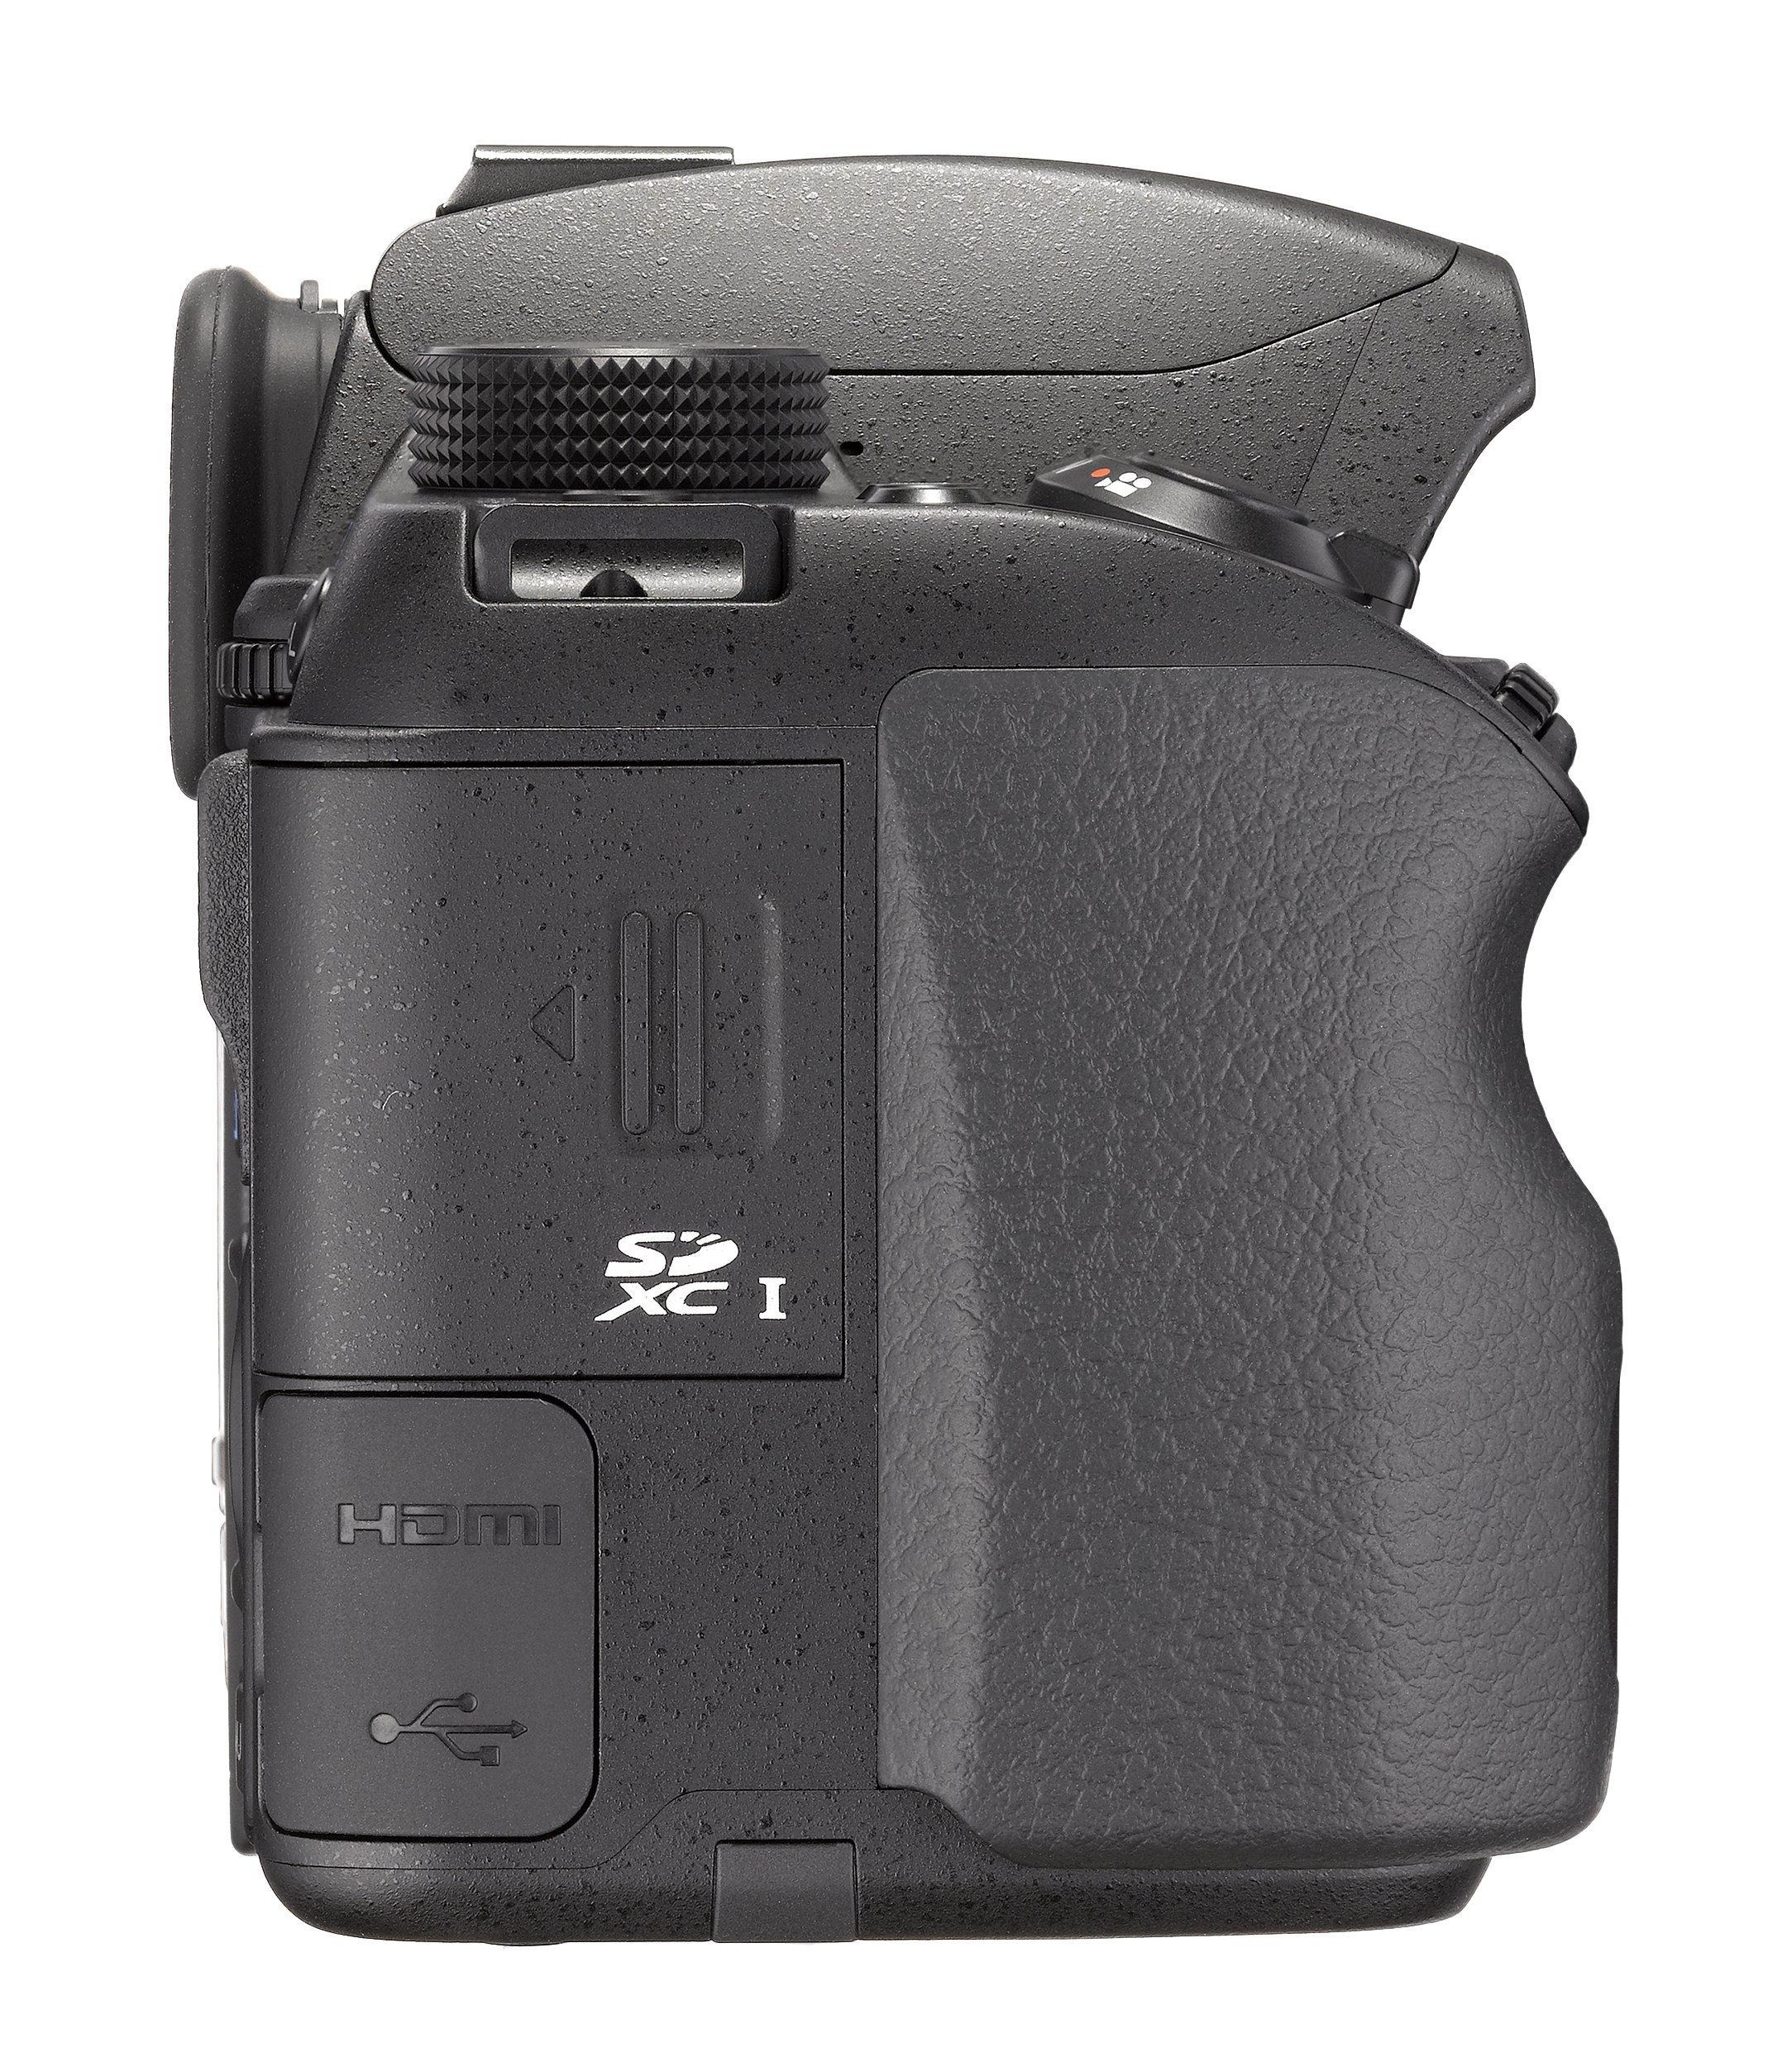 Pentax K-70 Weather-Sealed DSLR Camera, Body Only (Black) by Pentax (Image #2)